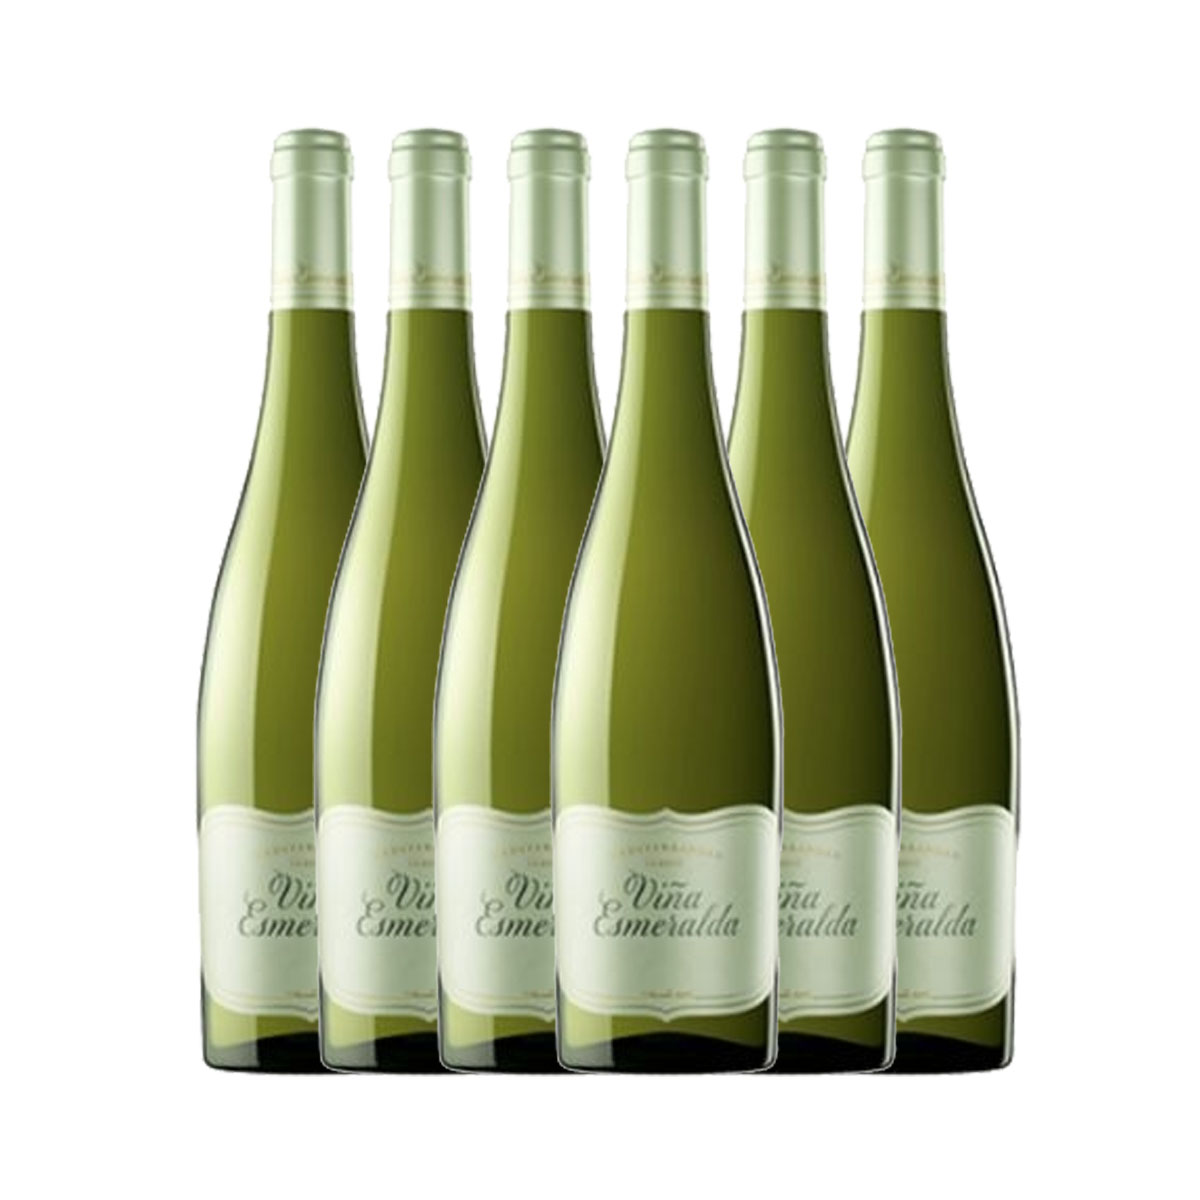 Kit 6x Vinho Branco Espanhol Torres Esmeralda 750ml 2019